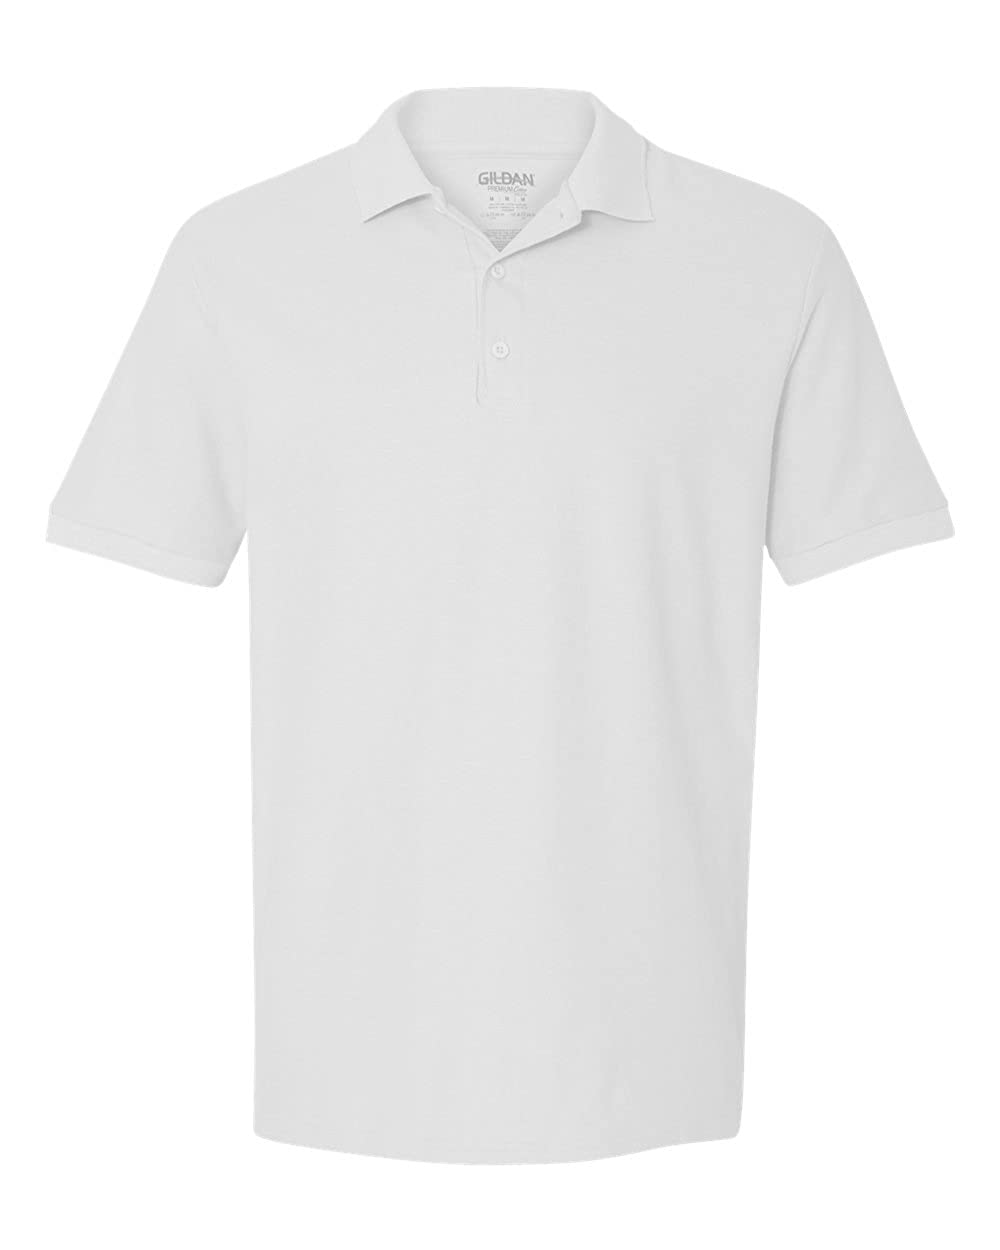 Gildan Mens Double-Needle Side Seamed Pique Polo Shirt